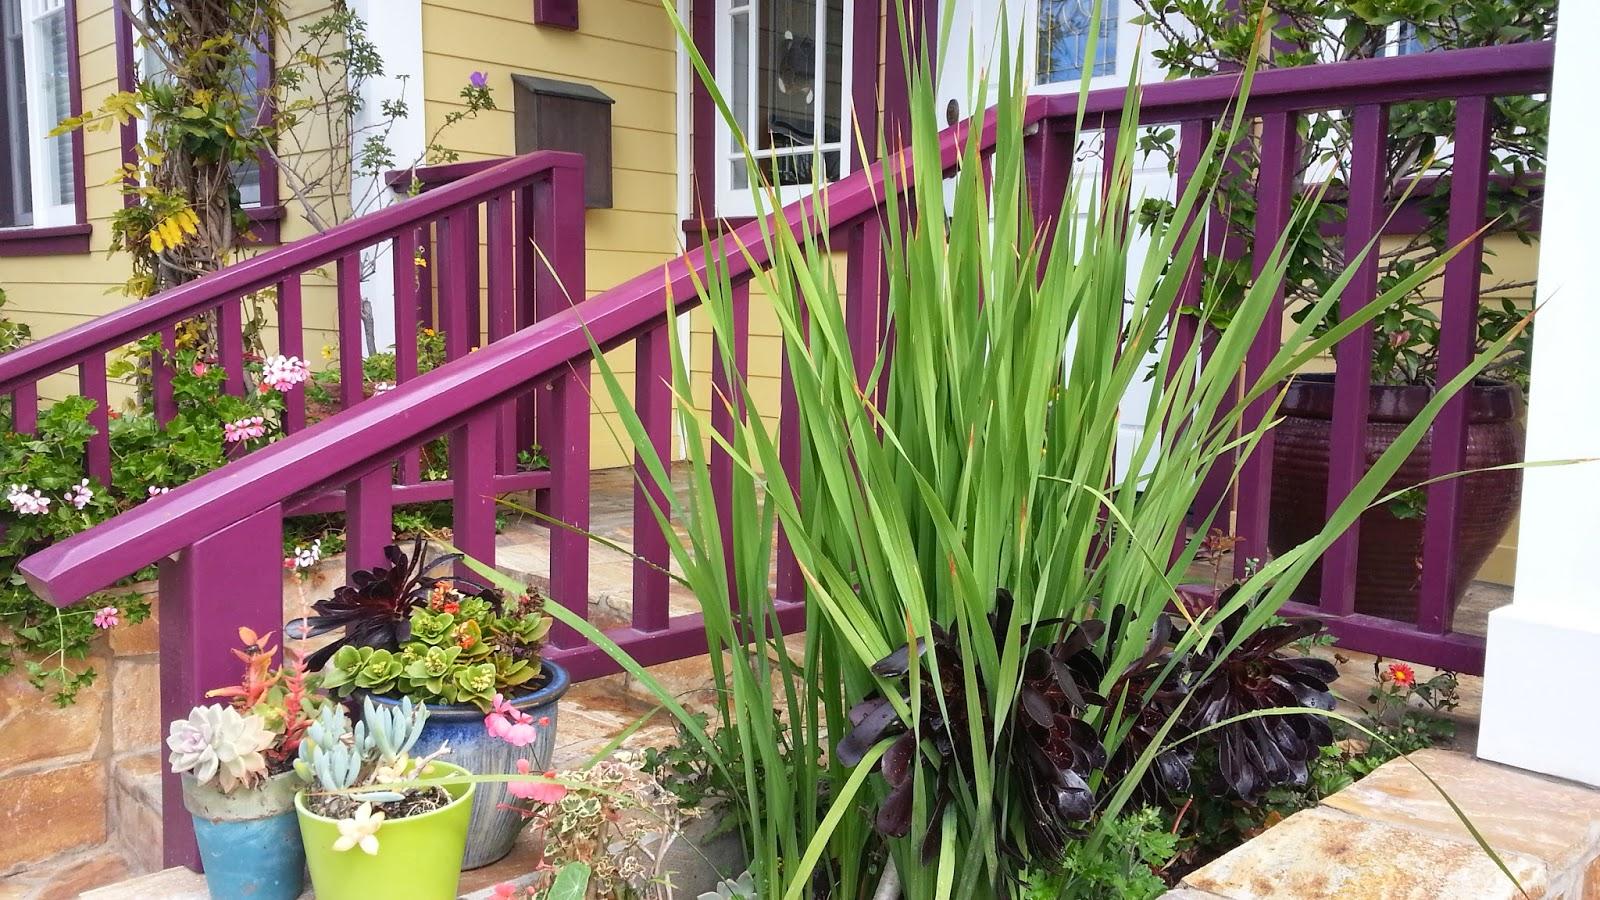 mar vista green garden showcase 3616 ocean view avenue cluster 2f